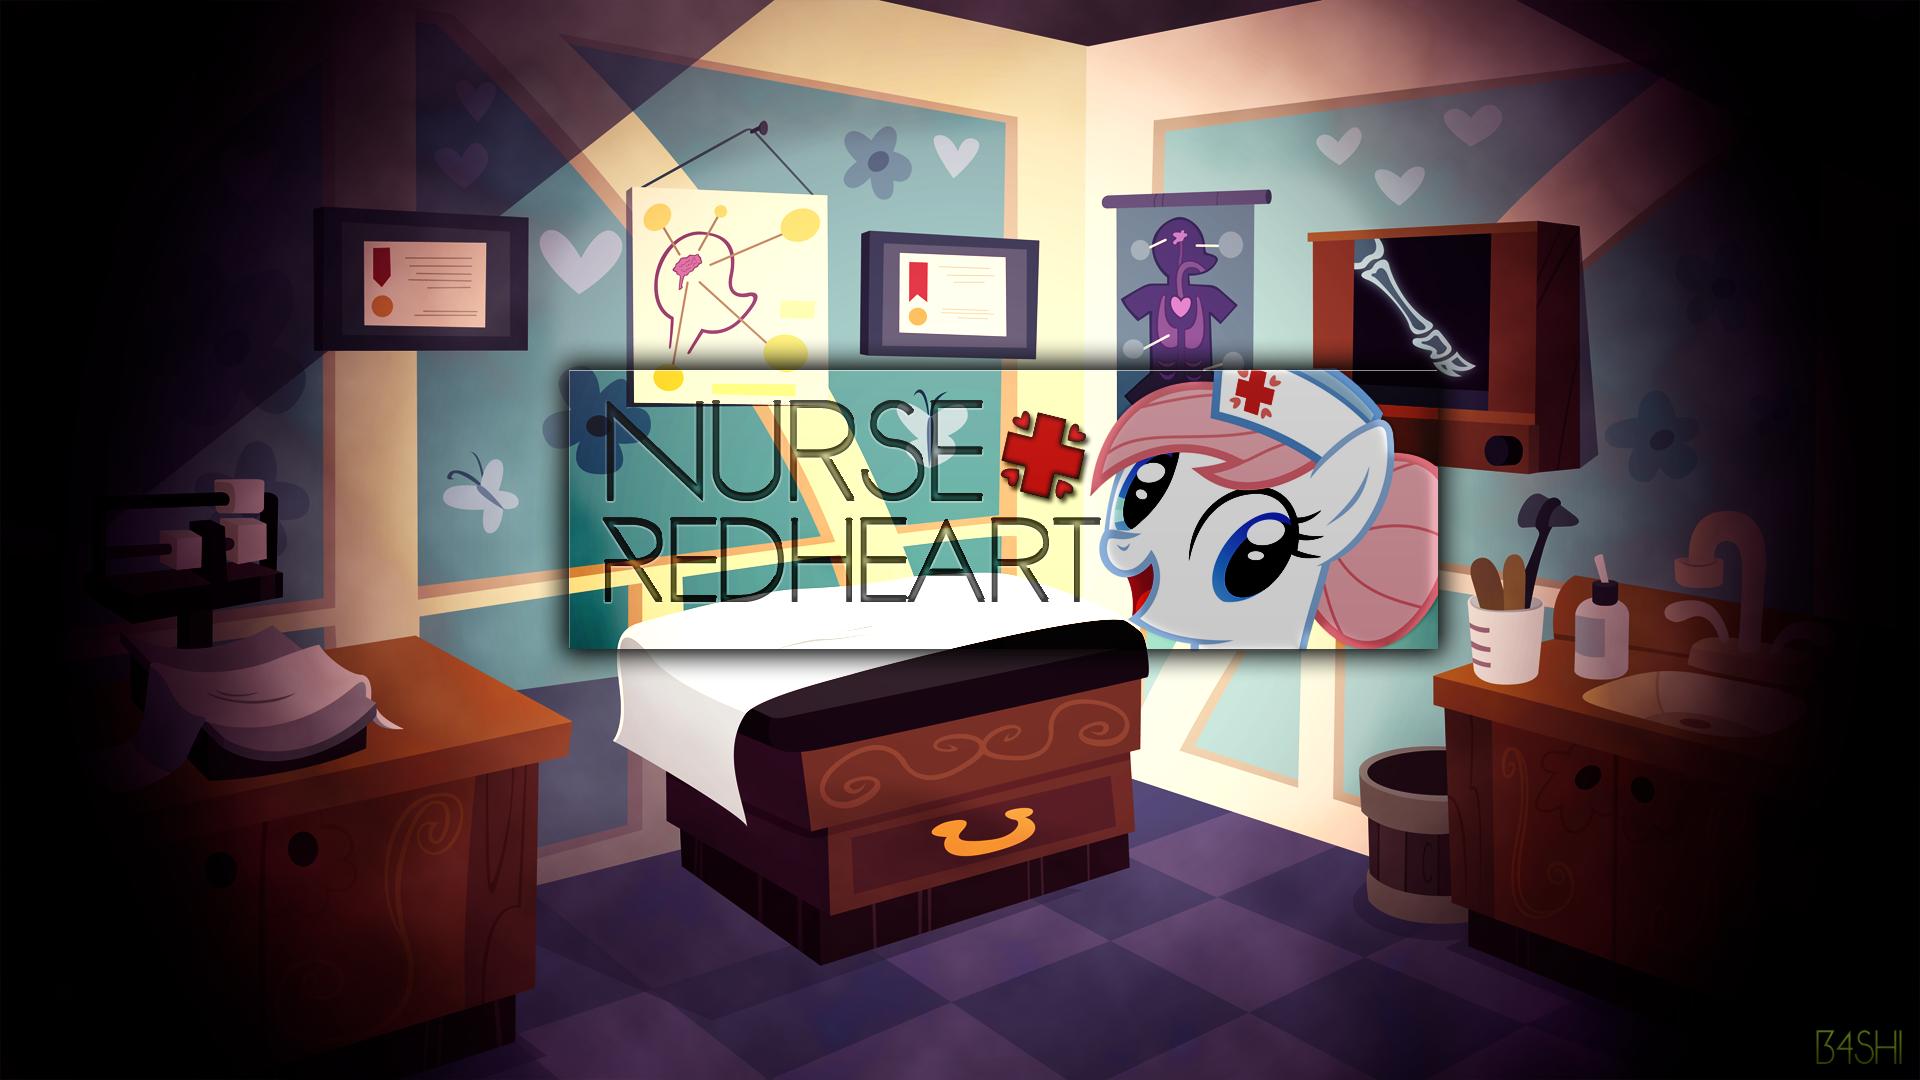 Nurse Redheart - Wallpaper by BonesWolbach, DrFatalChunk, Rainbowb4sh and The-Smiling-Pony